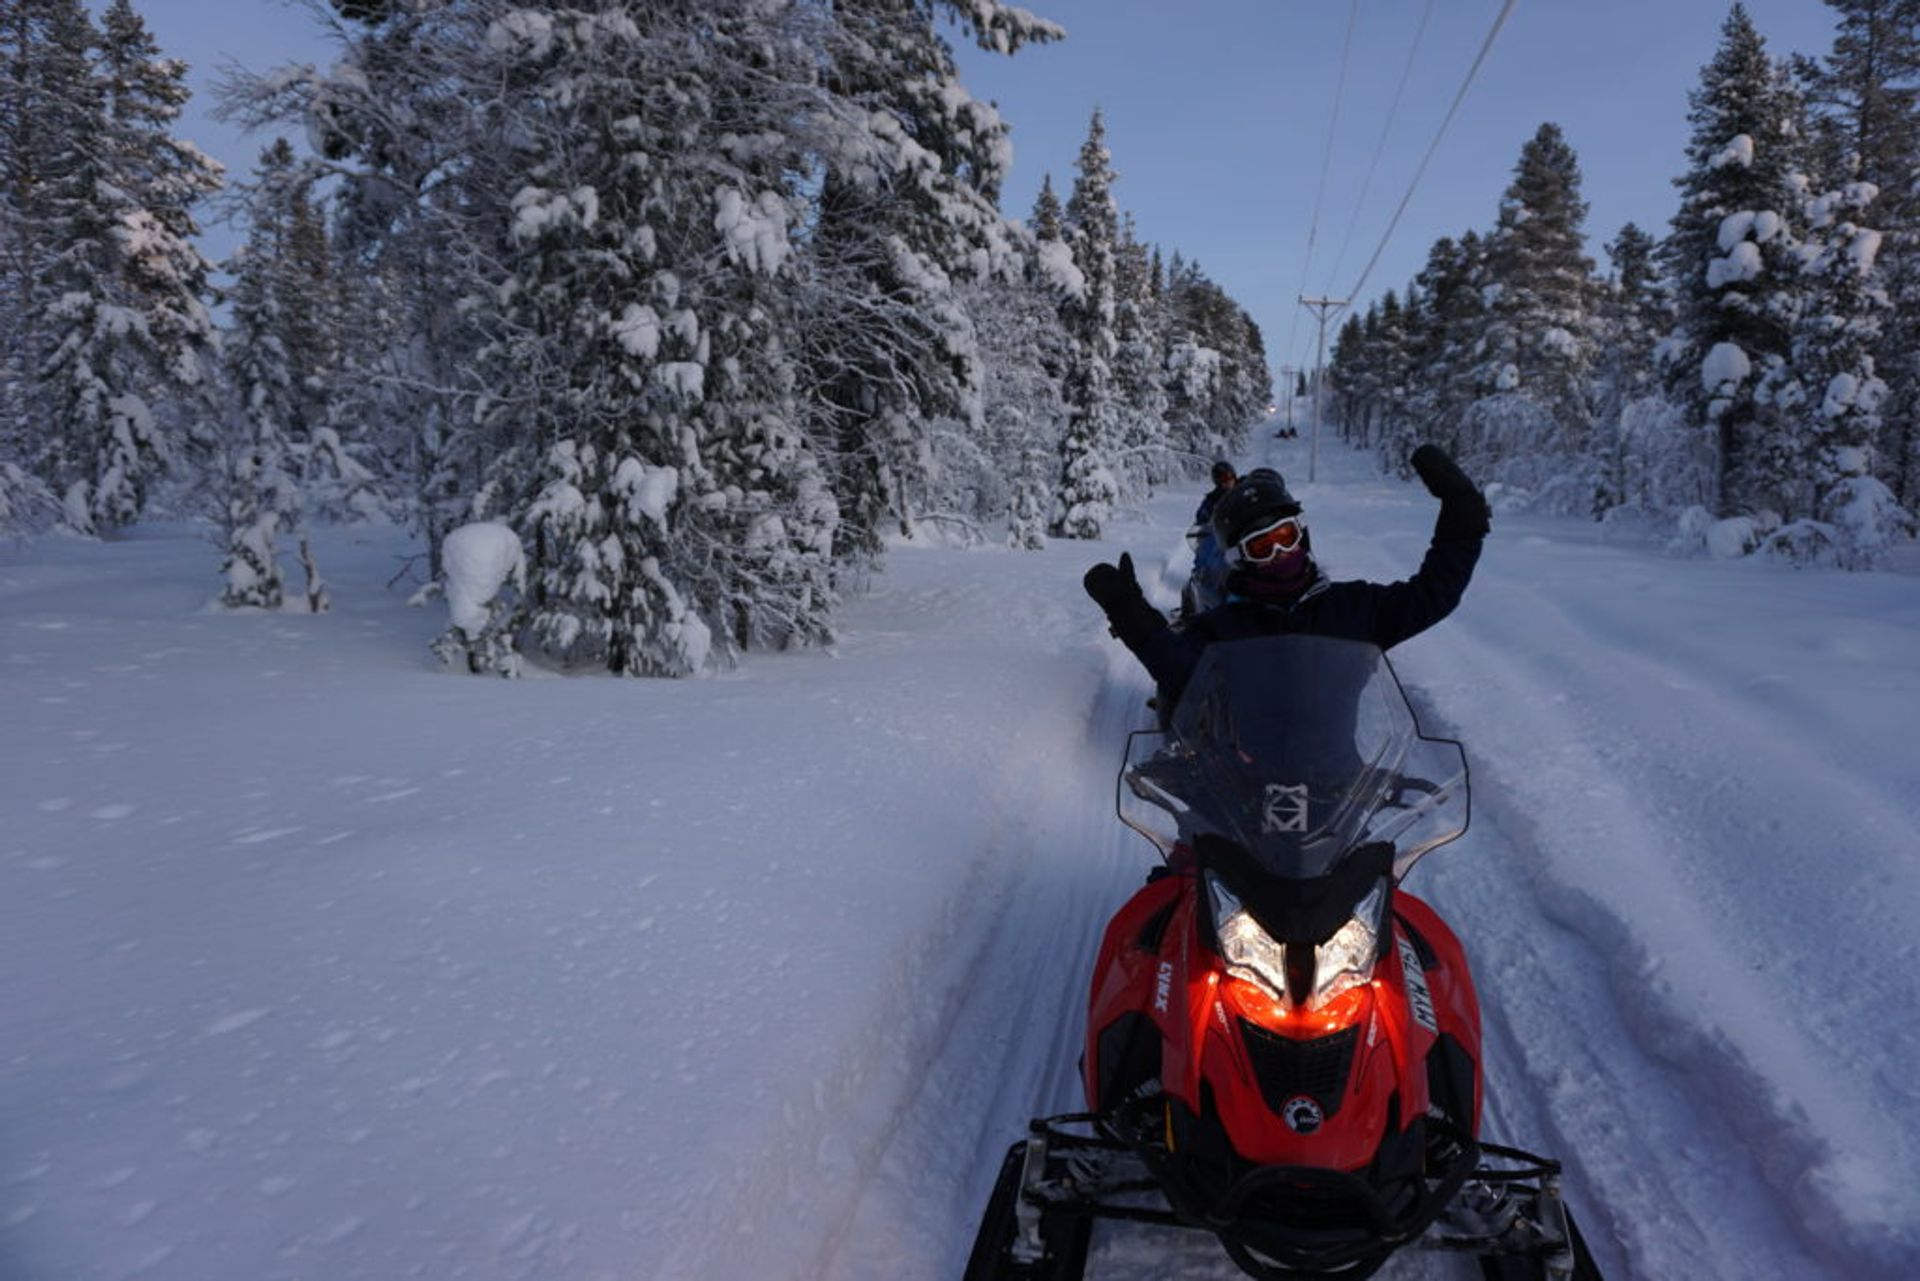 Snow scooter tour, Source: Inez